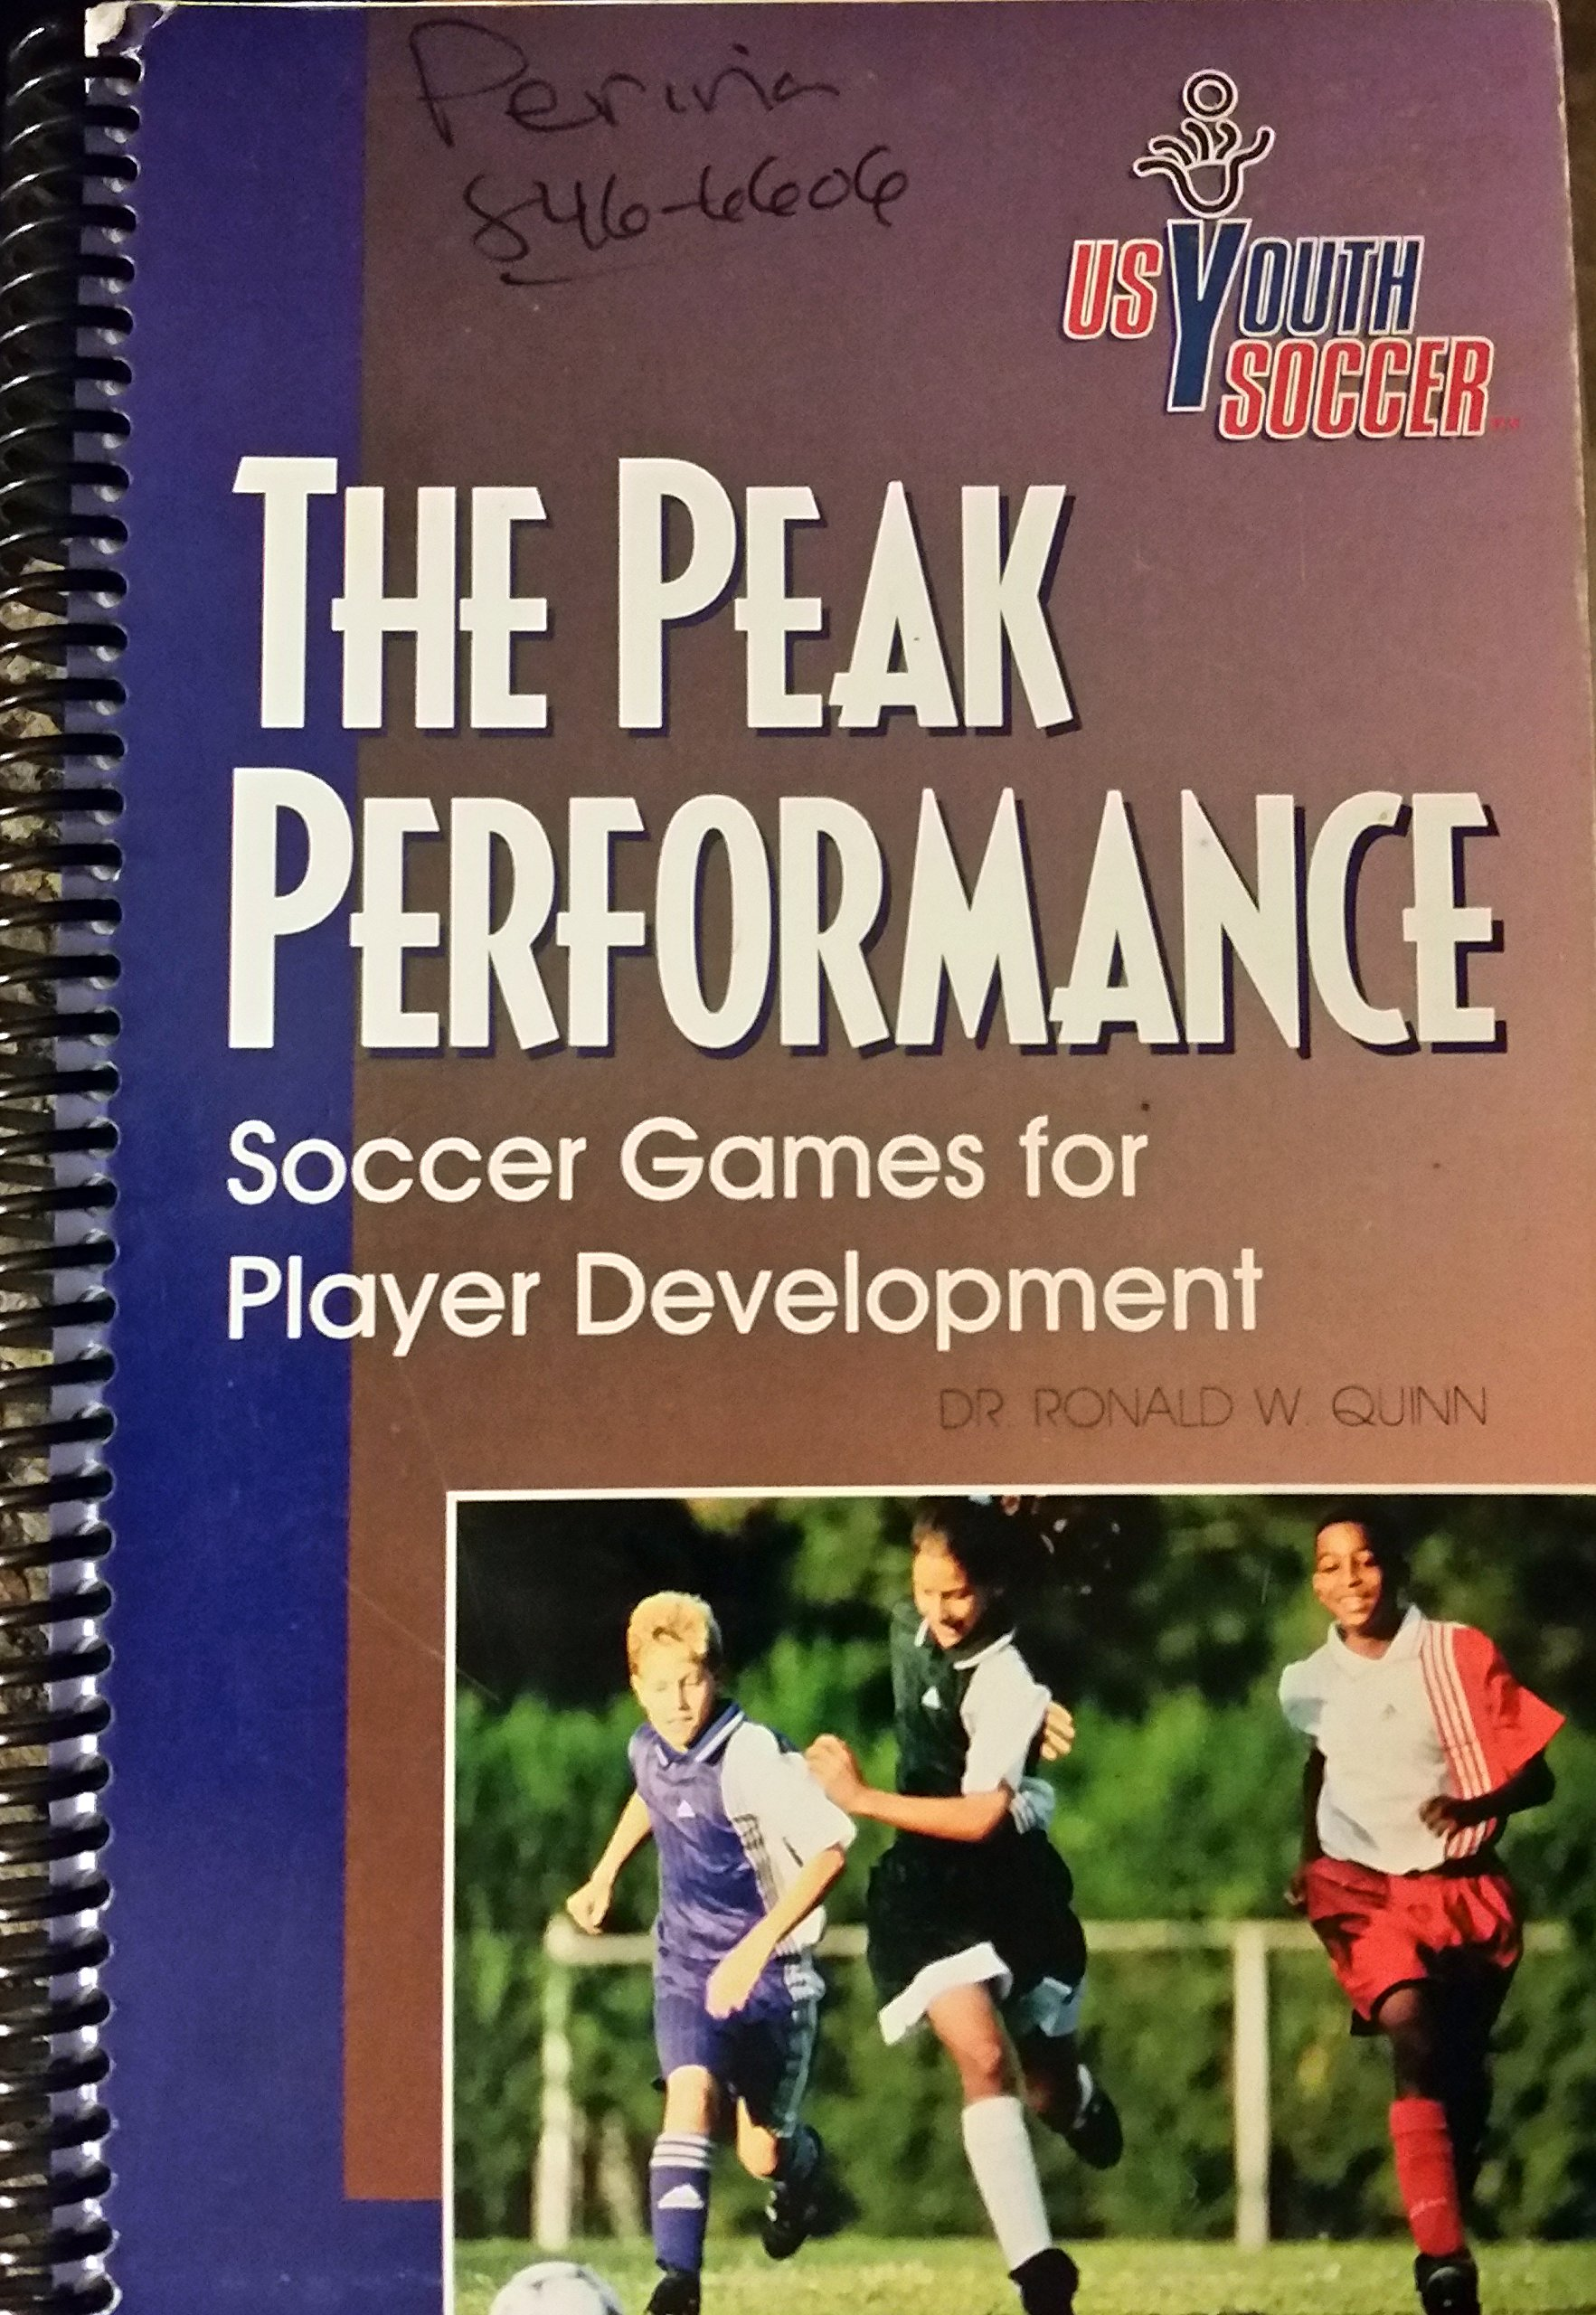 The Peak Performance: Soccer Games for Player Development